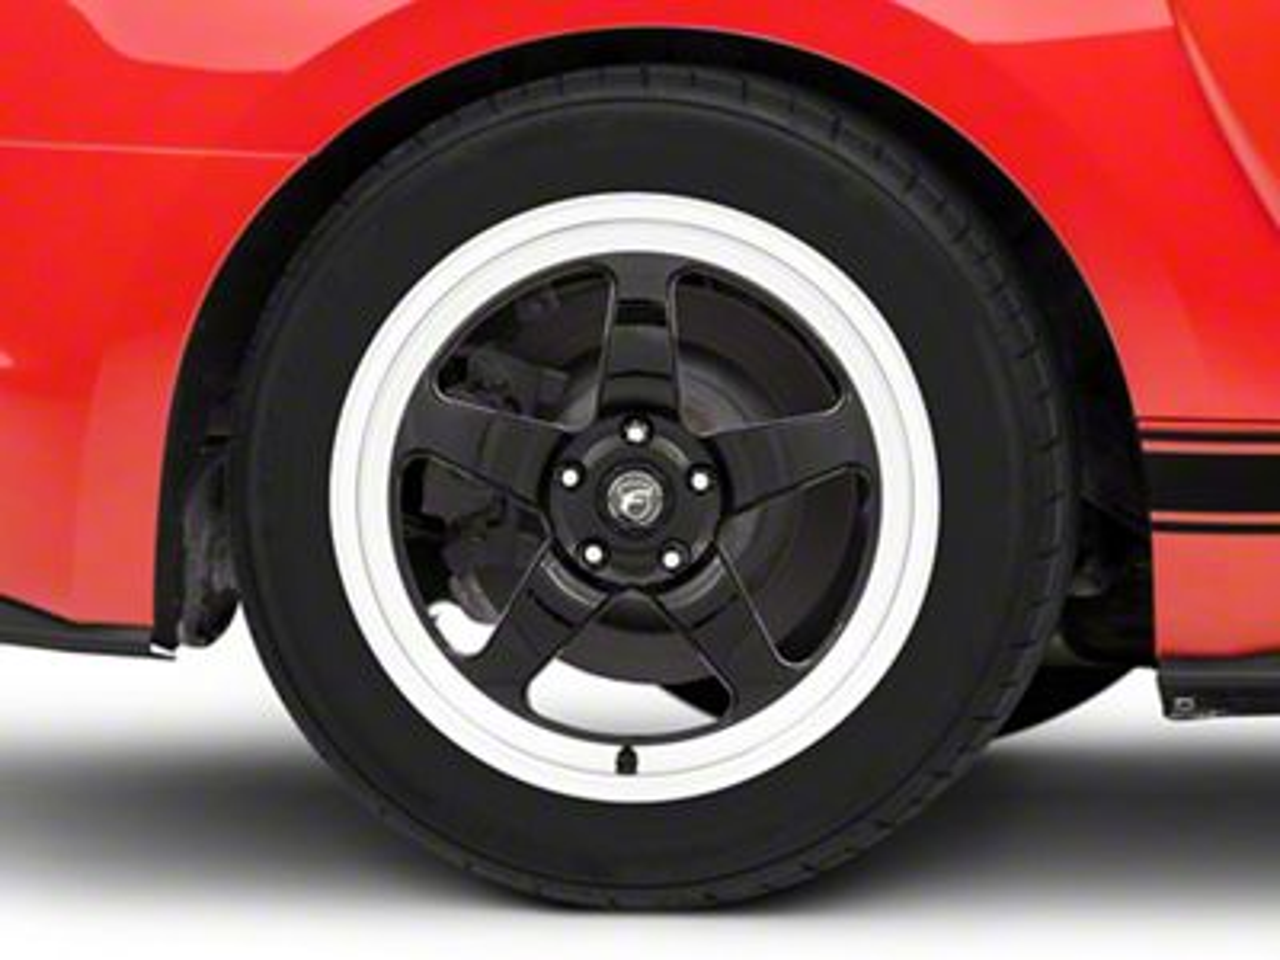 Forgestar D5 Drag Black Machined Wheel - 18x10 - Rear Only (15-19 GT, EcoBoost, V6)